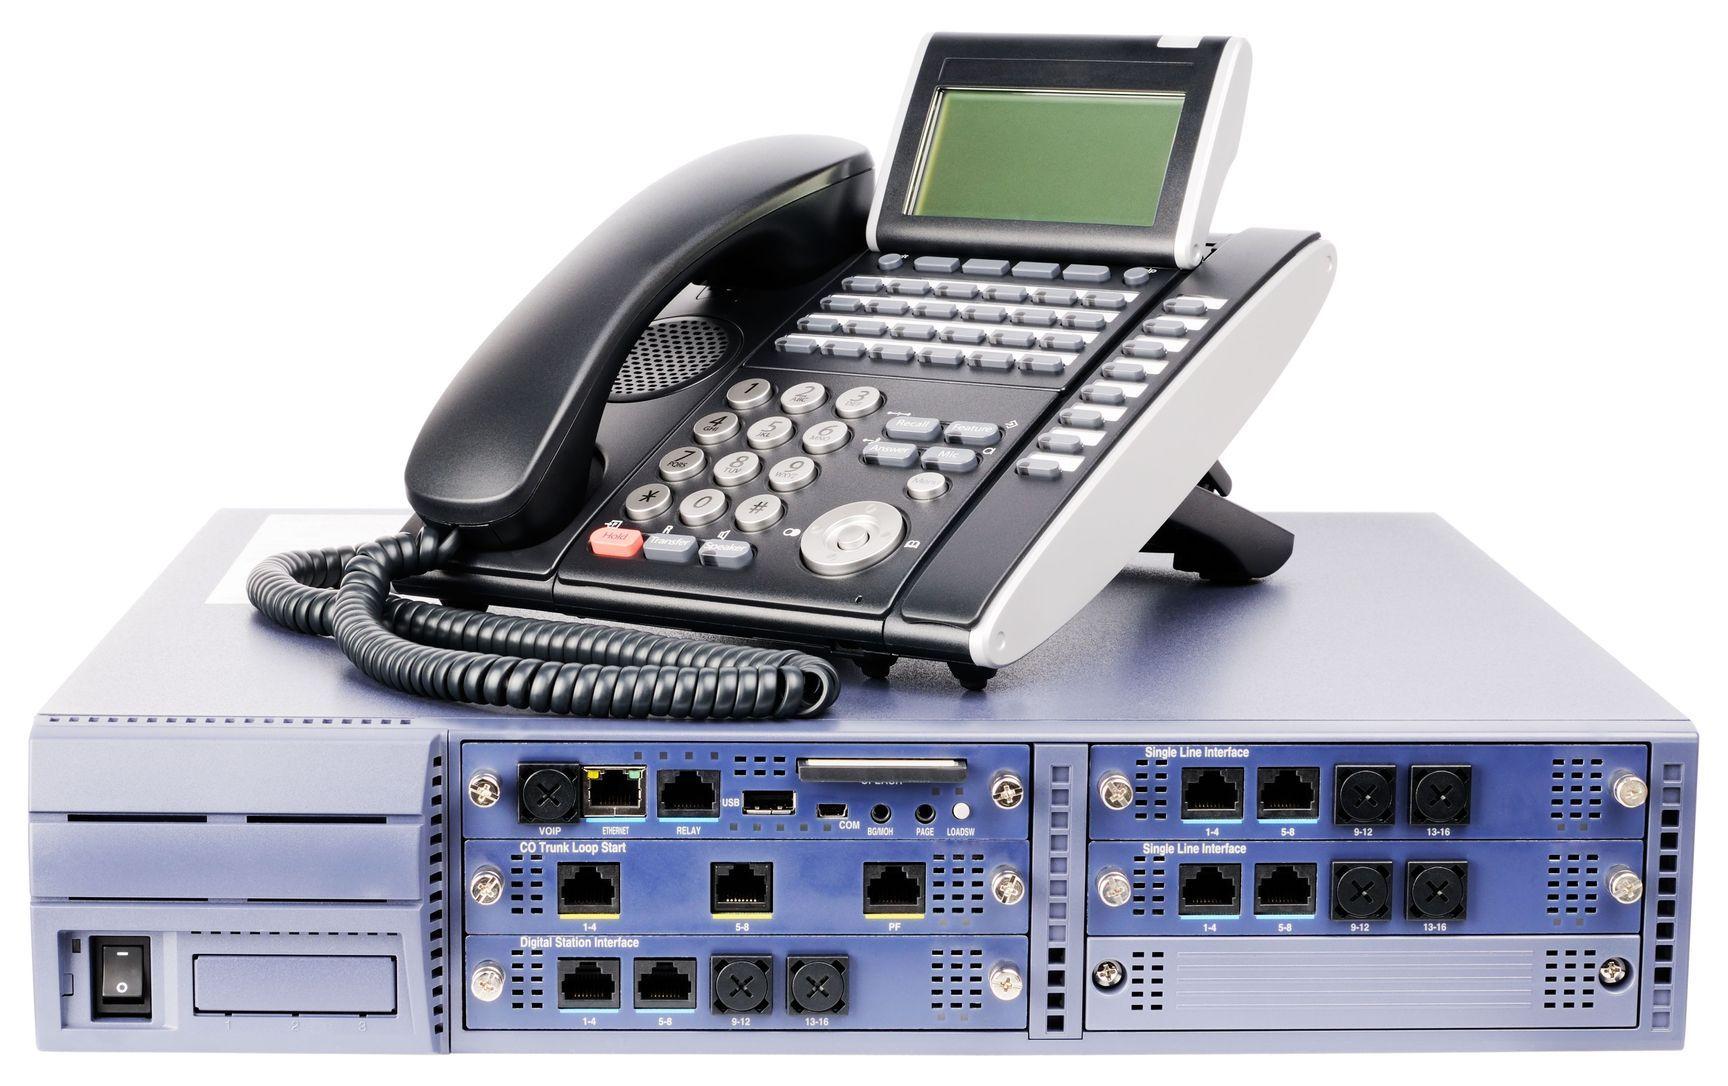 PABX System Installations in Dubai